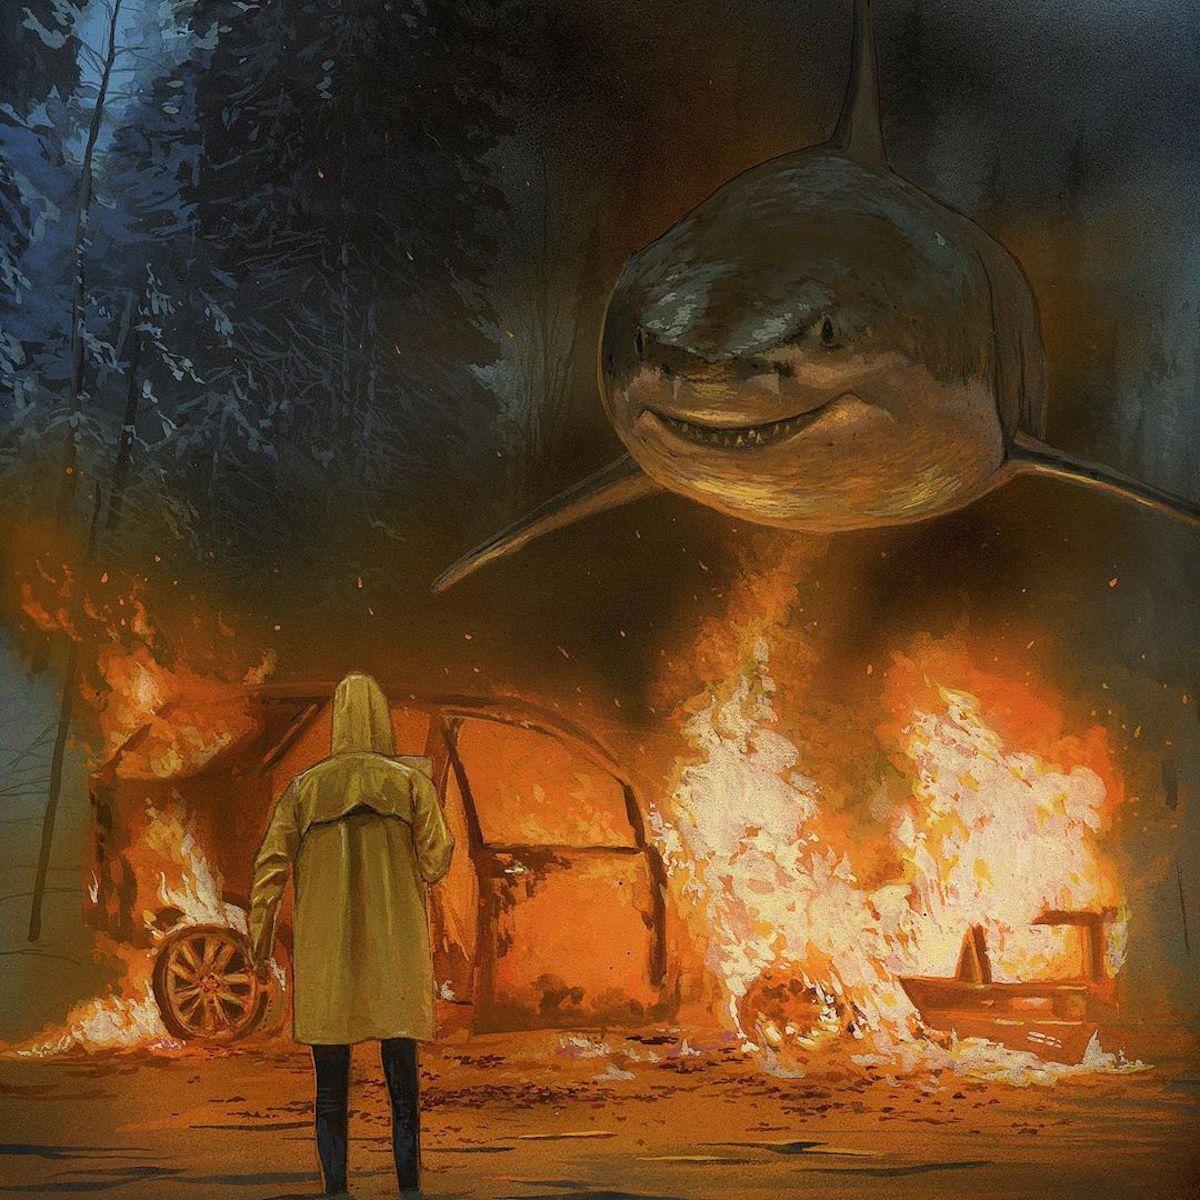 chris-austin-shark-paintings-moss-and-fog-9